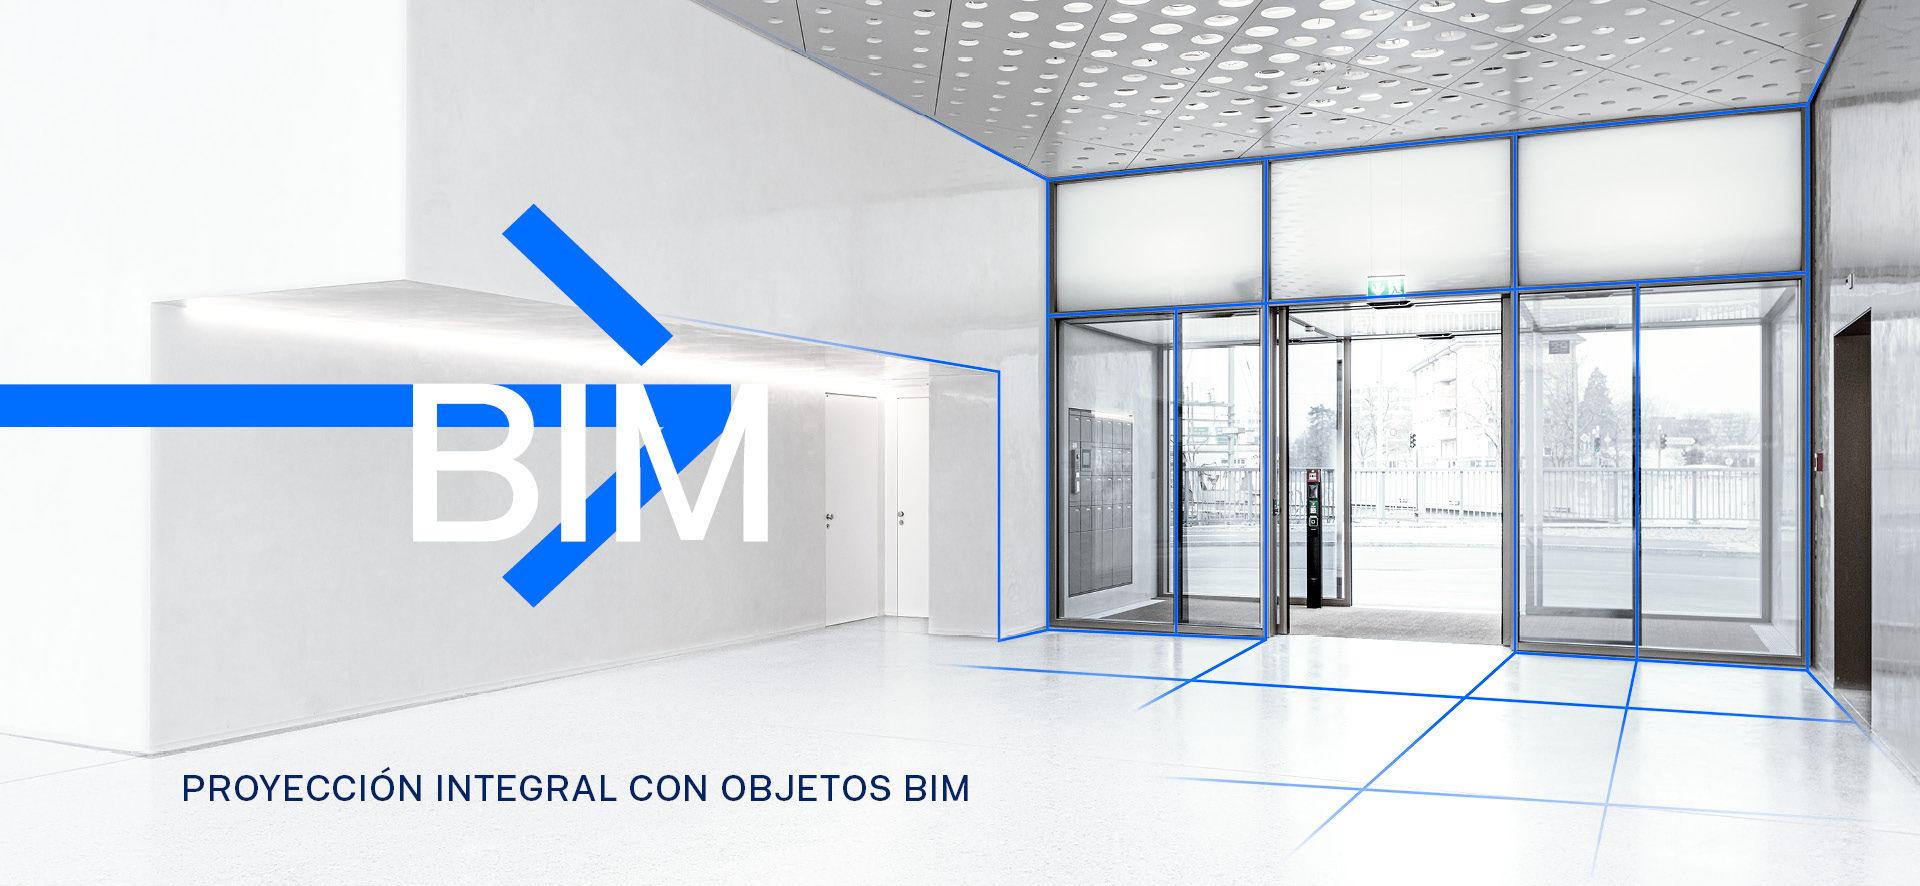 BIM - Integral planning with GEZE BIM objects